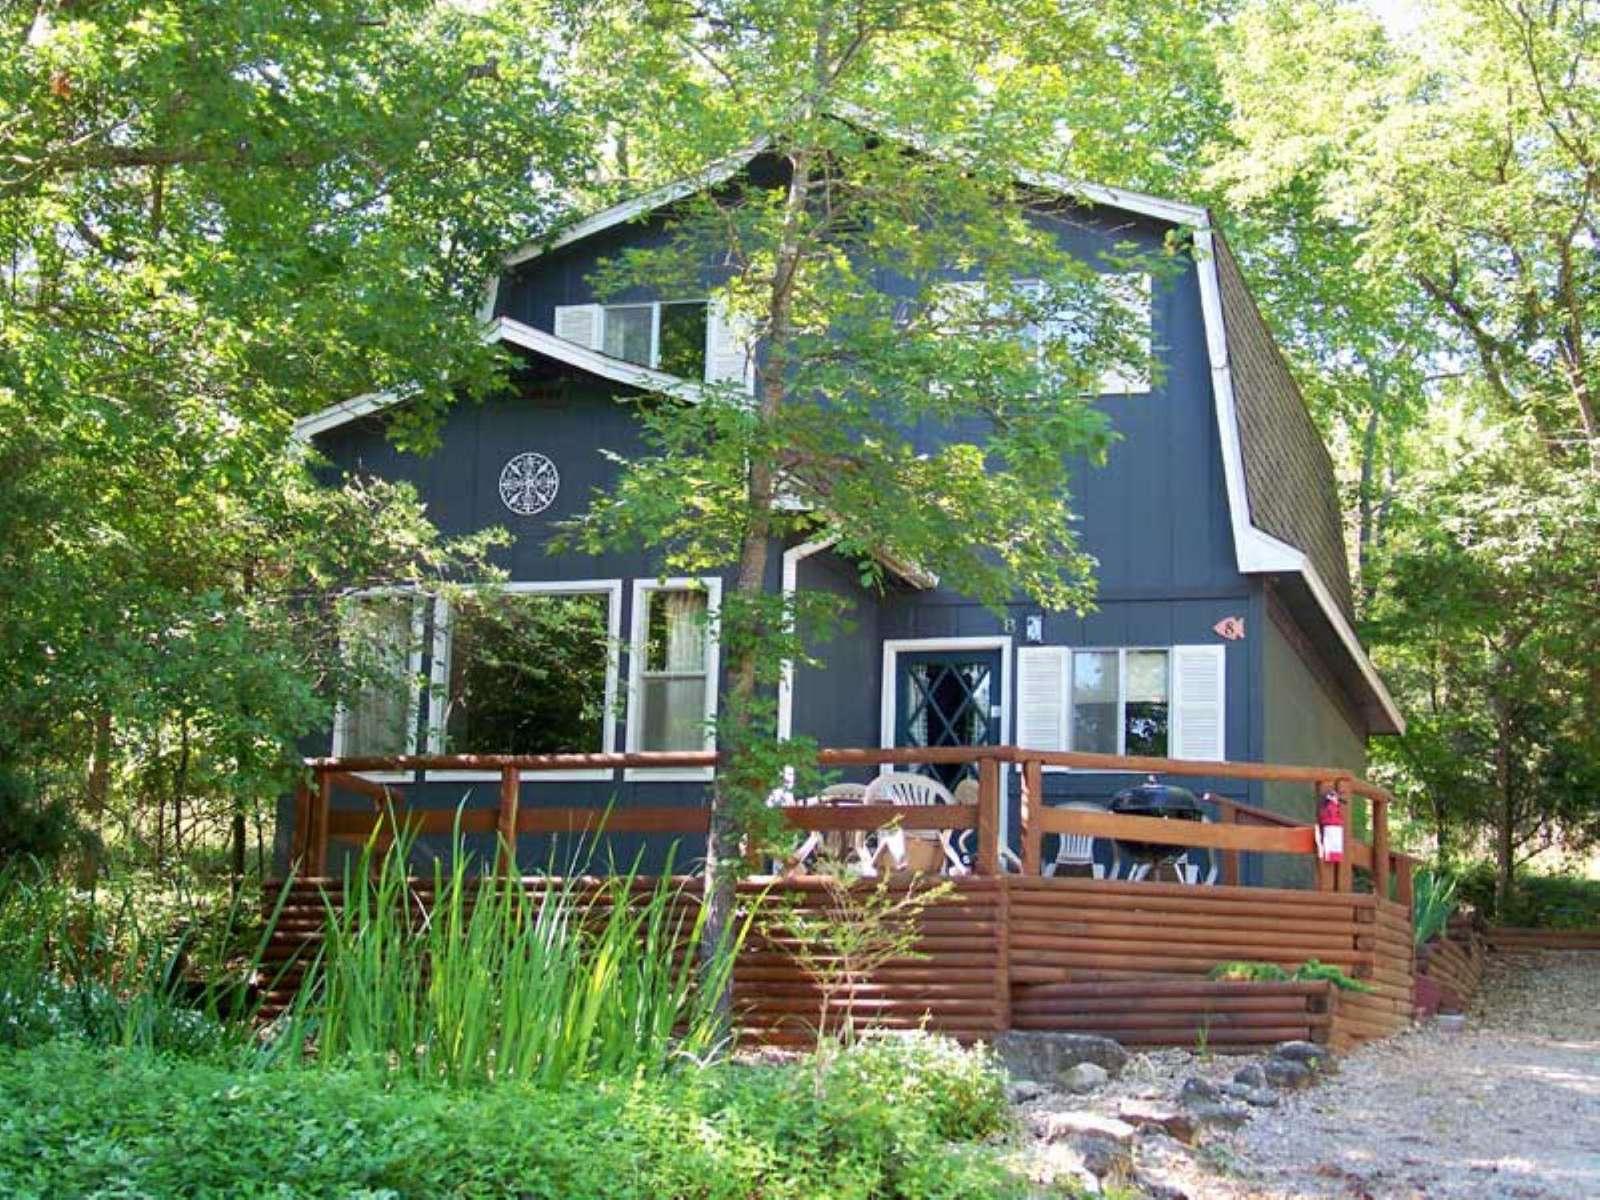 TR 3D Timber Glen - property